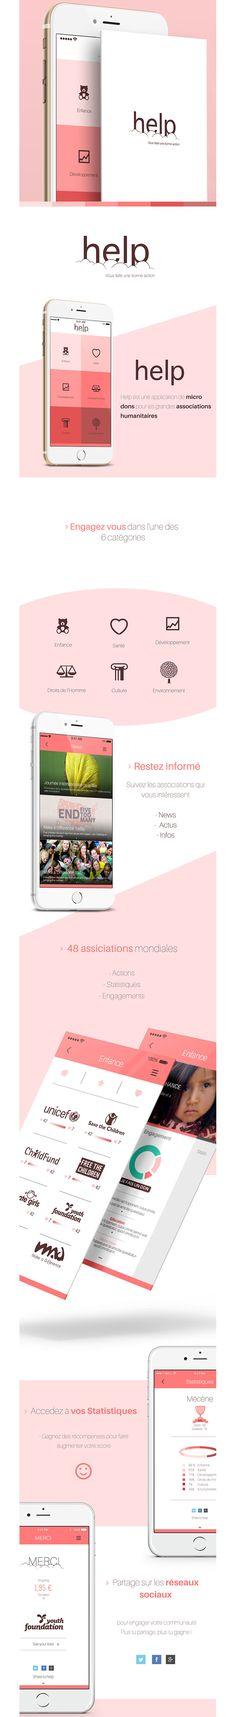 Mobile App / Flat Design